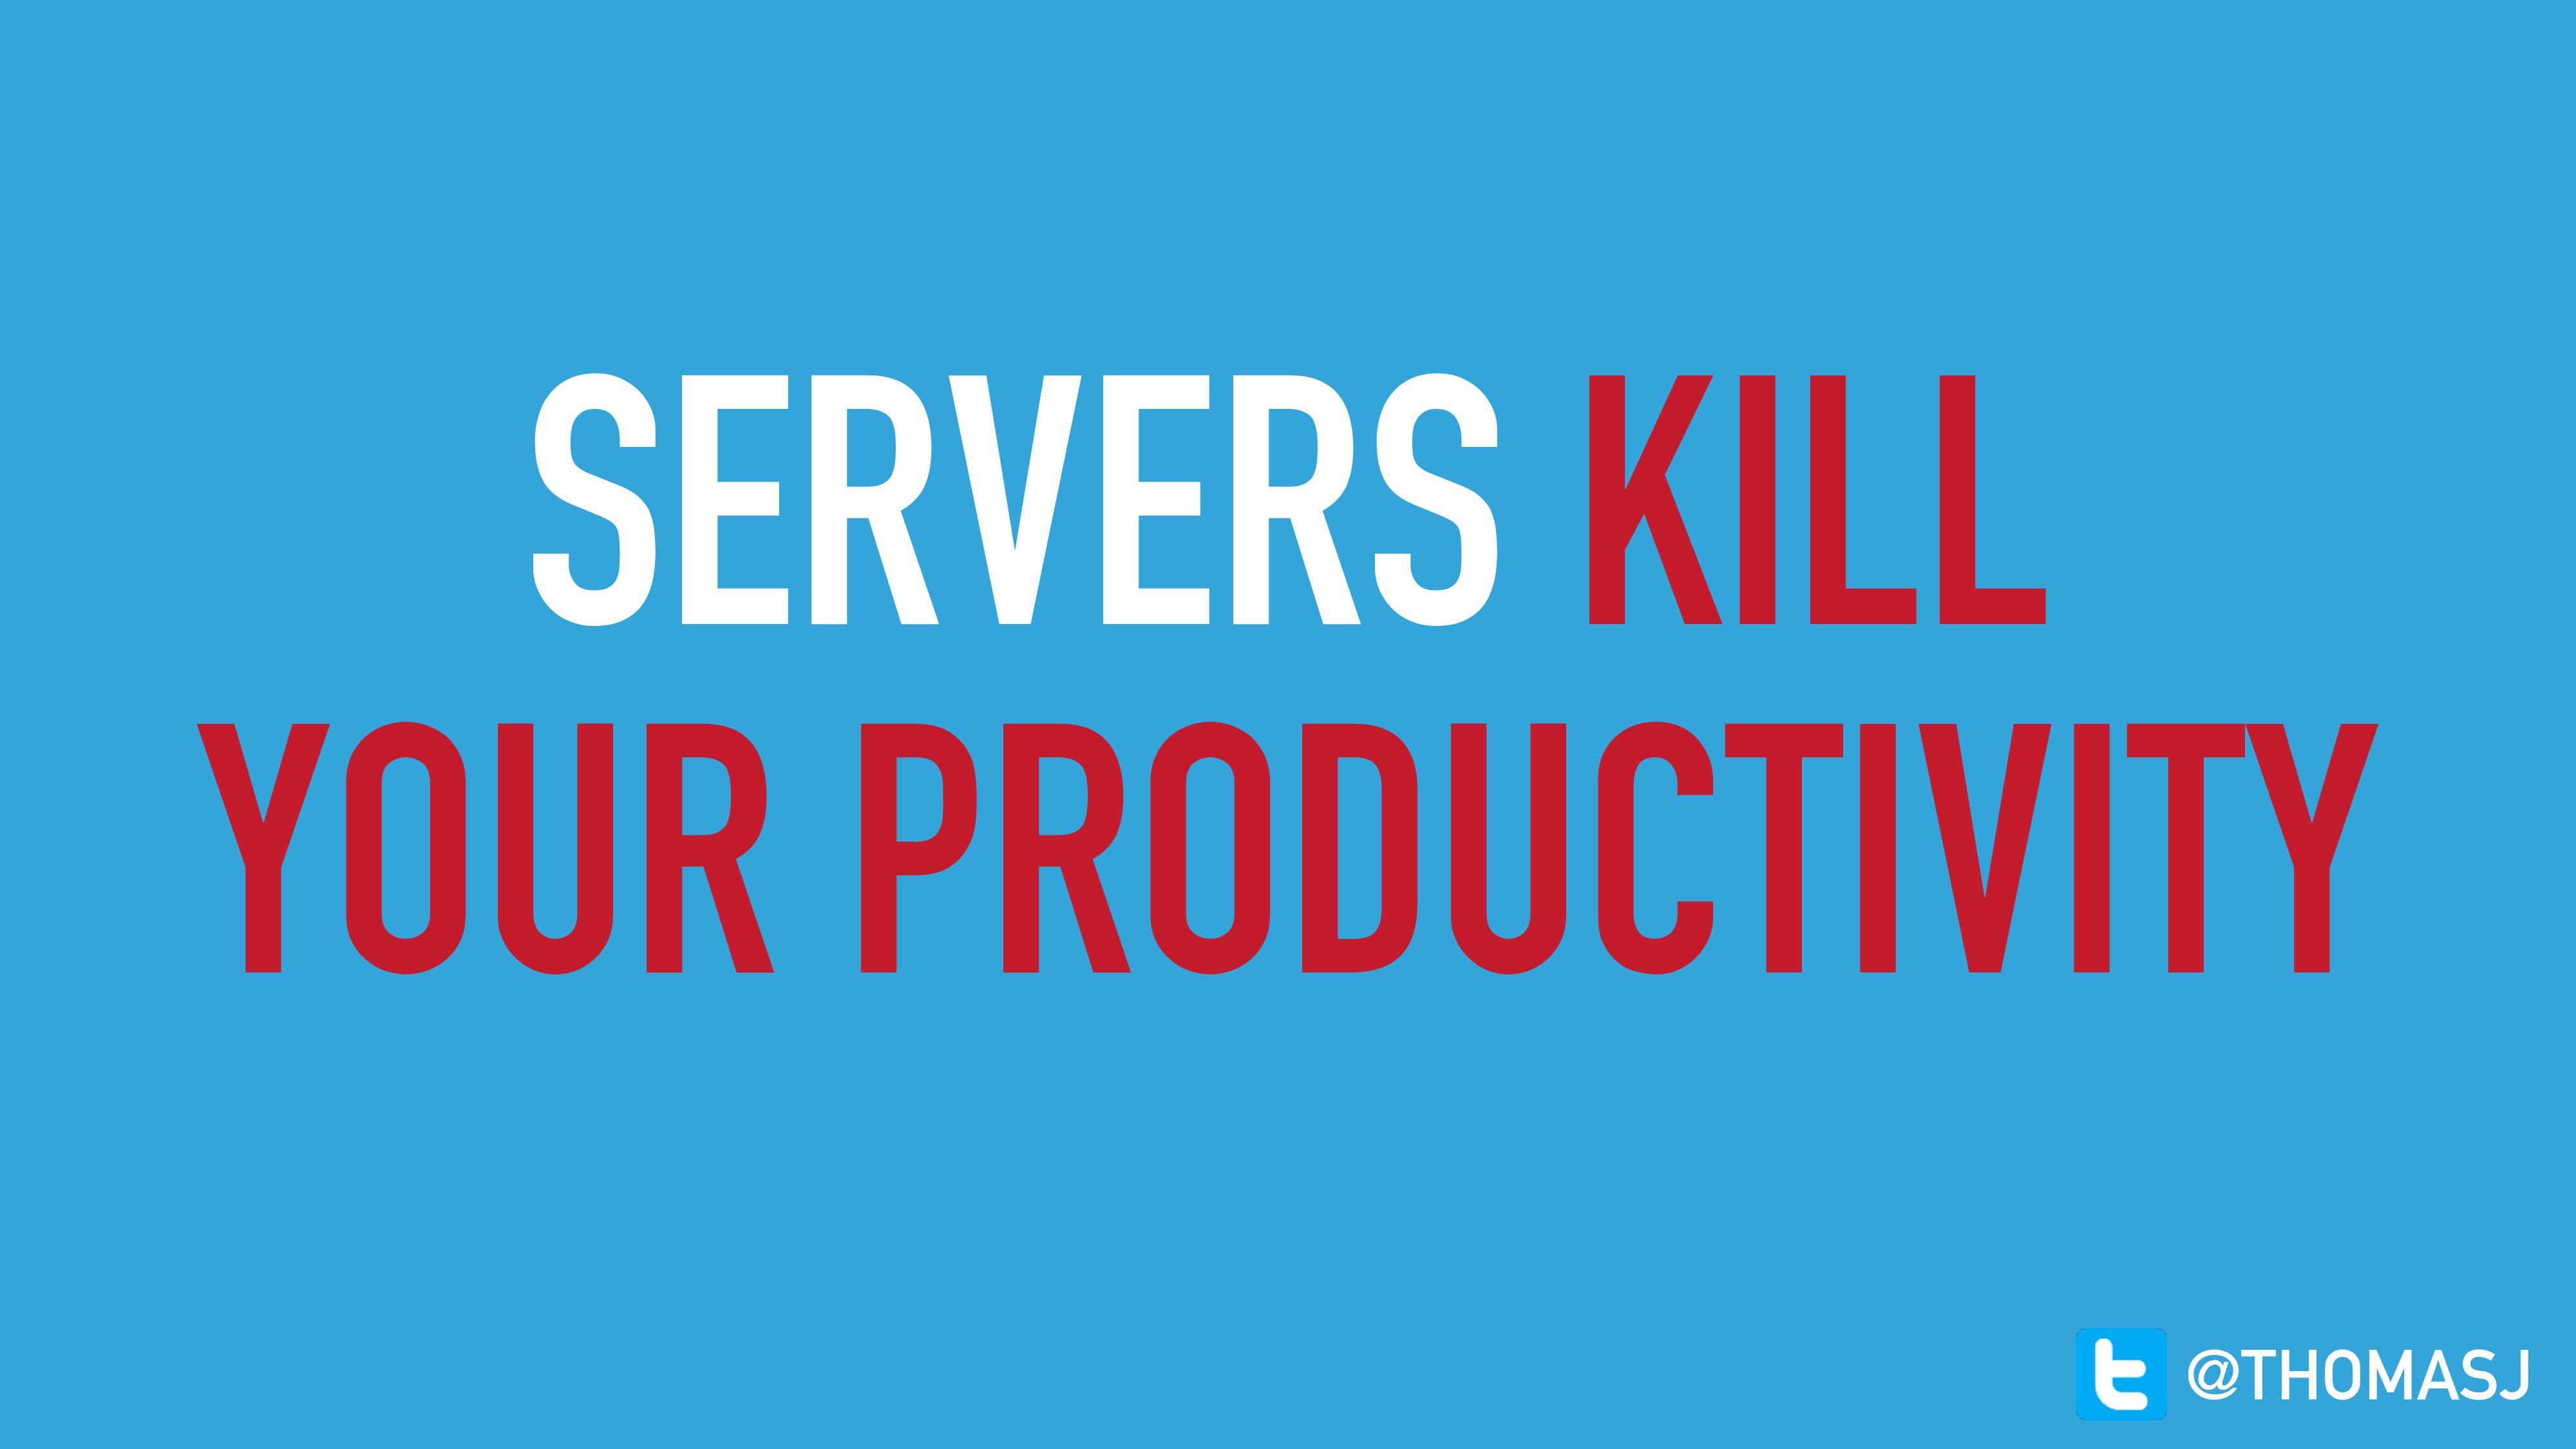 SERVERS KILL YOUR PRODUCTIVITY @THOMASJ